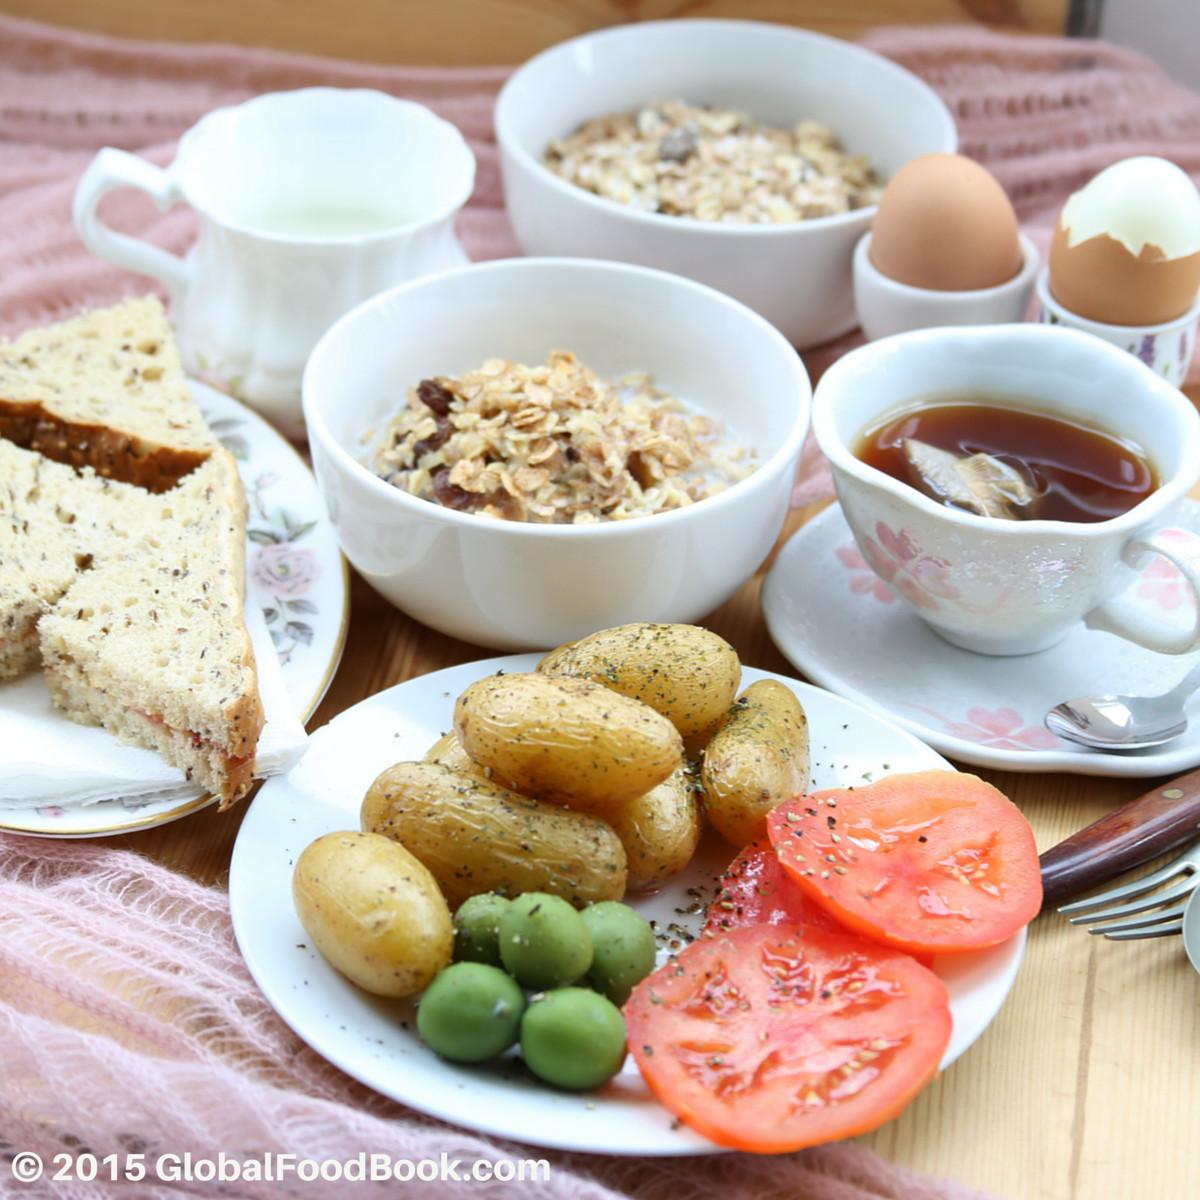 Big Healthy Breakfast  Eat A Big Healthy Breakfast To Get Your Eggs Fertilised